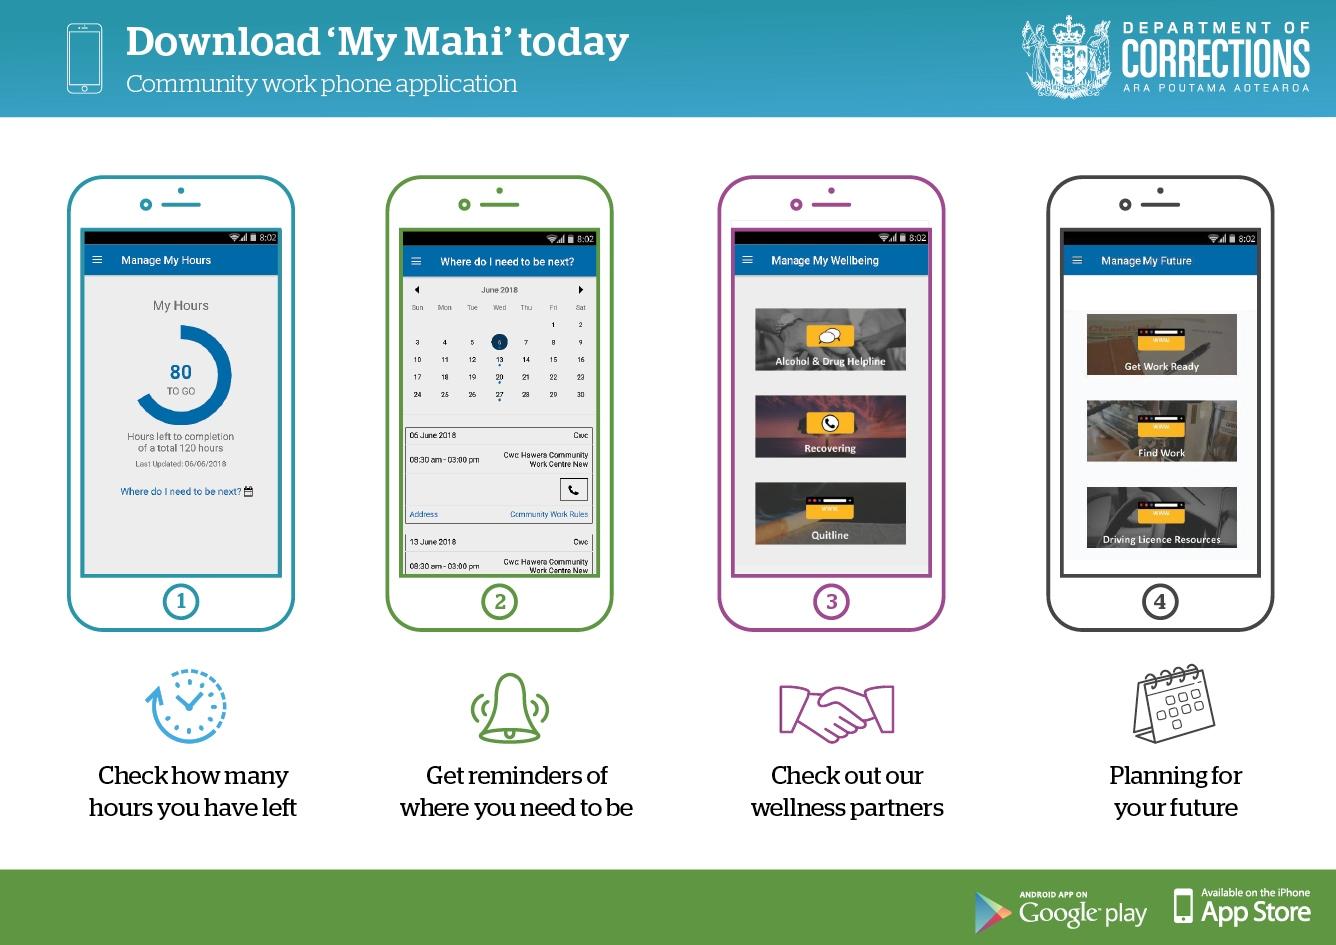 Download 'My Mahi' today